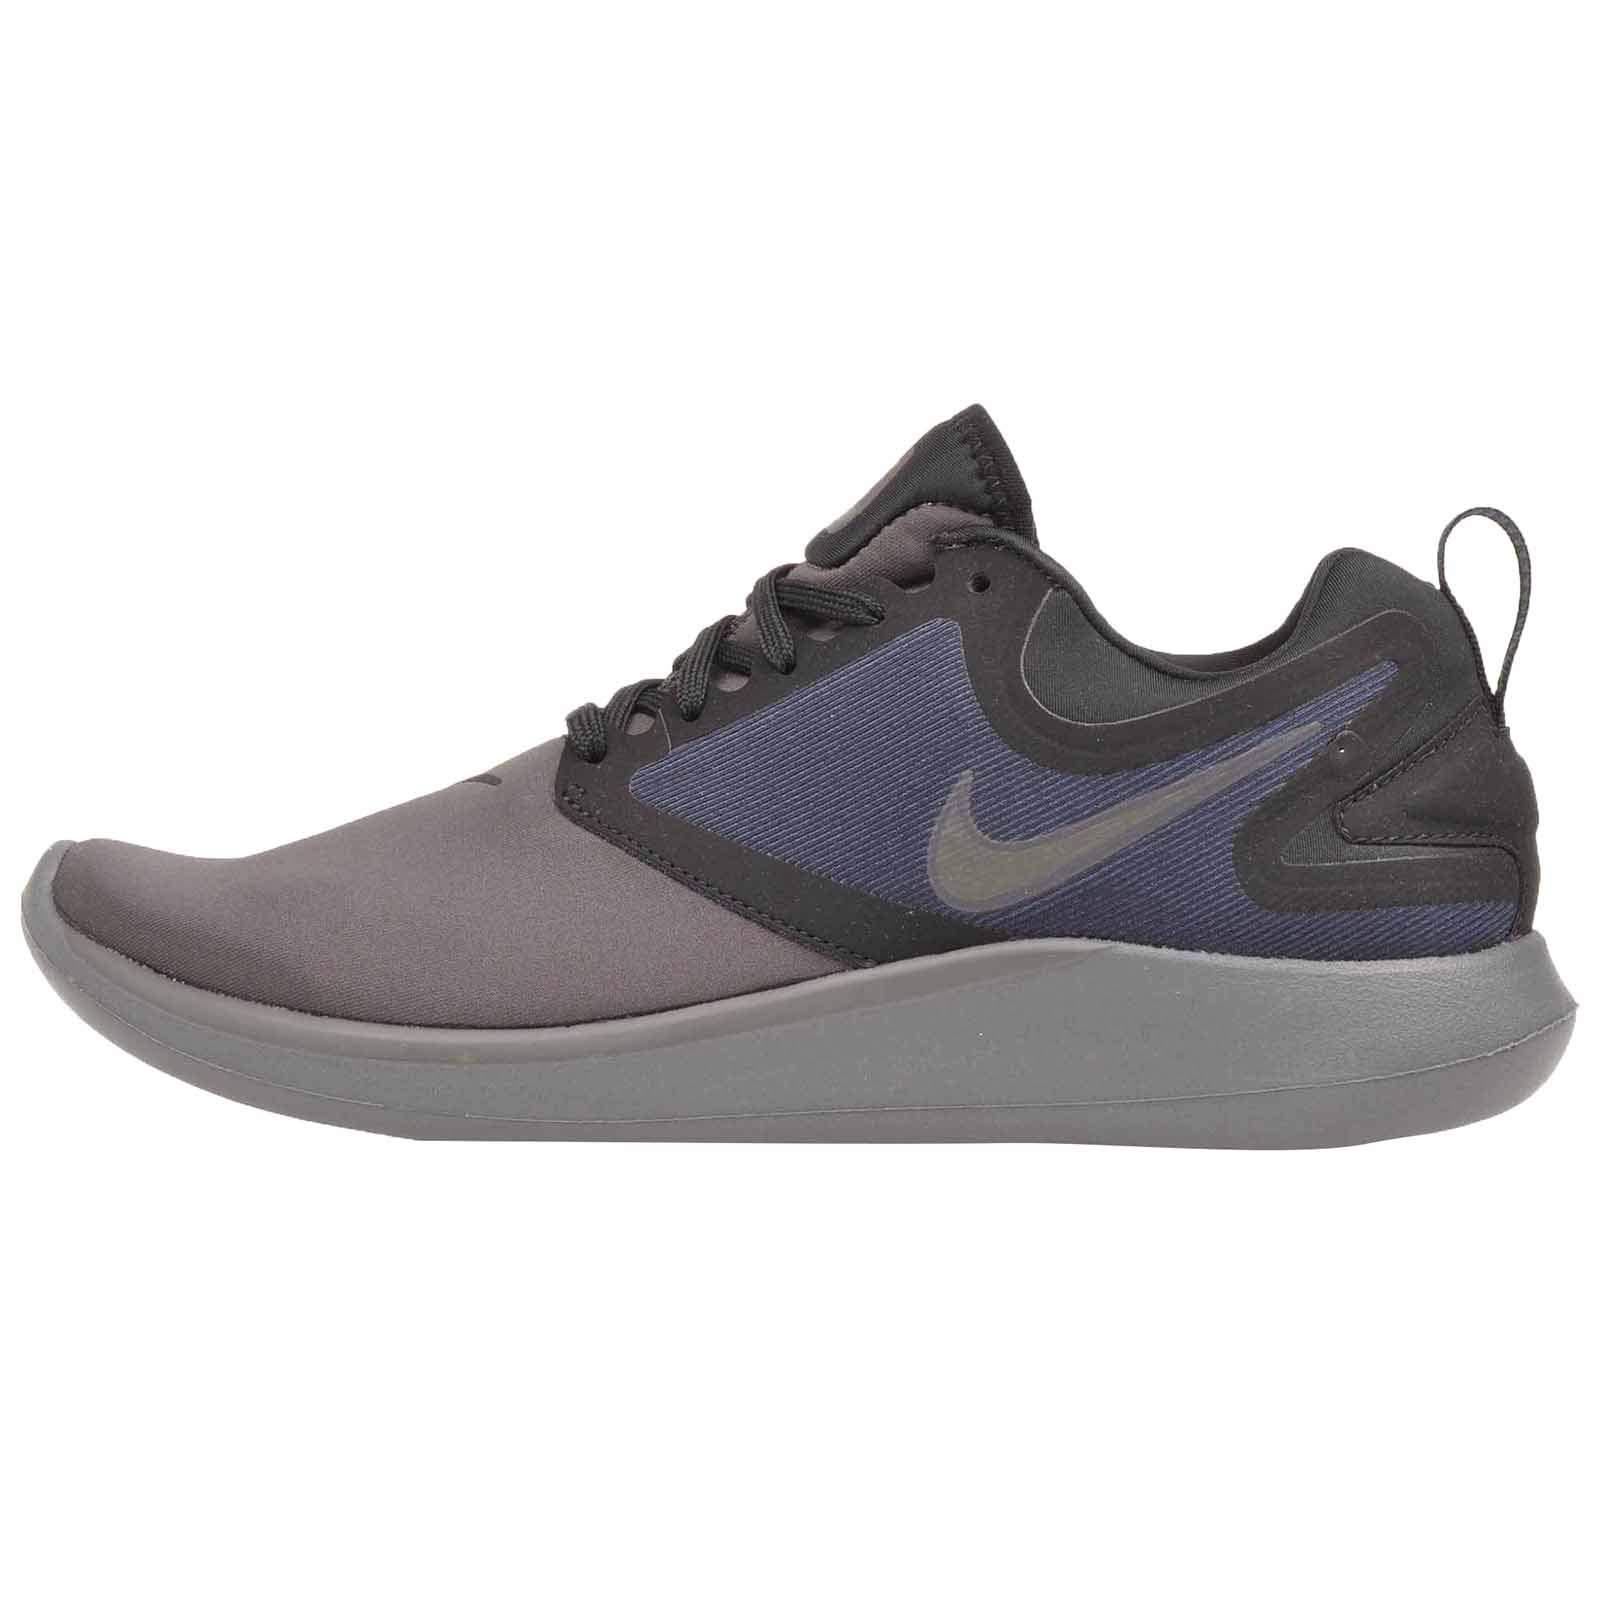 8c66d1a257de Galleon - Nike Women s Lunarsolo Running Shoes (Midnight Fog Midnight Fog